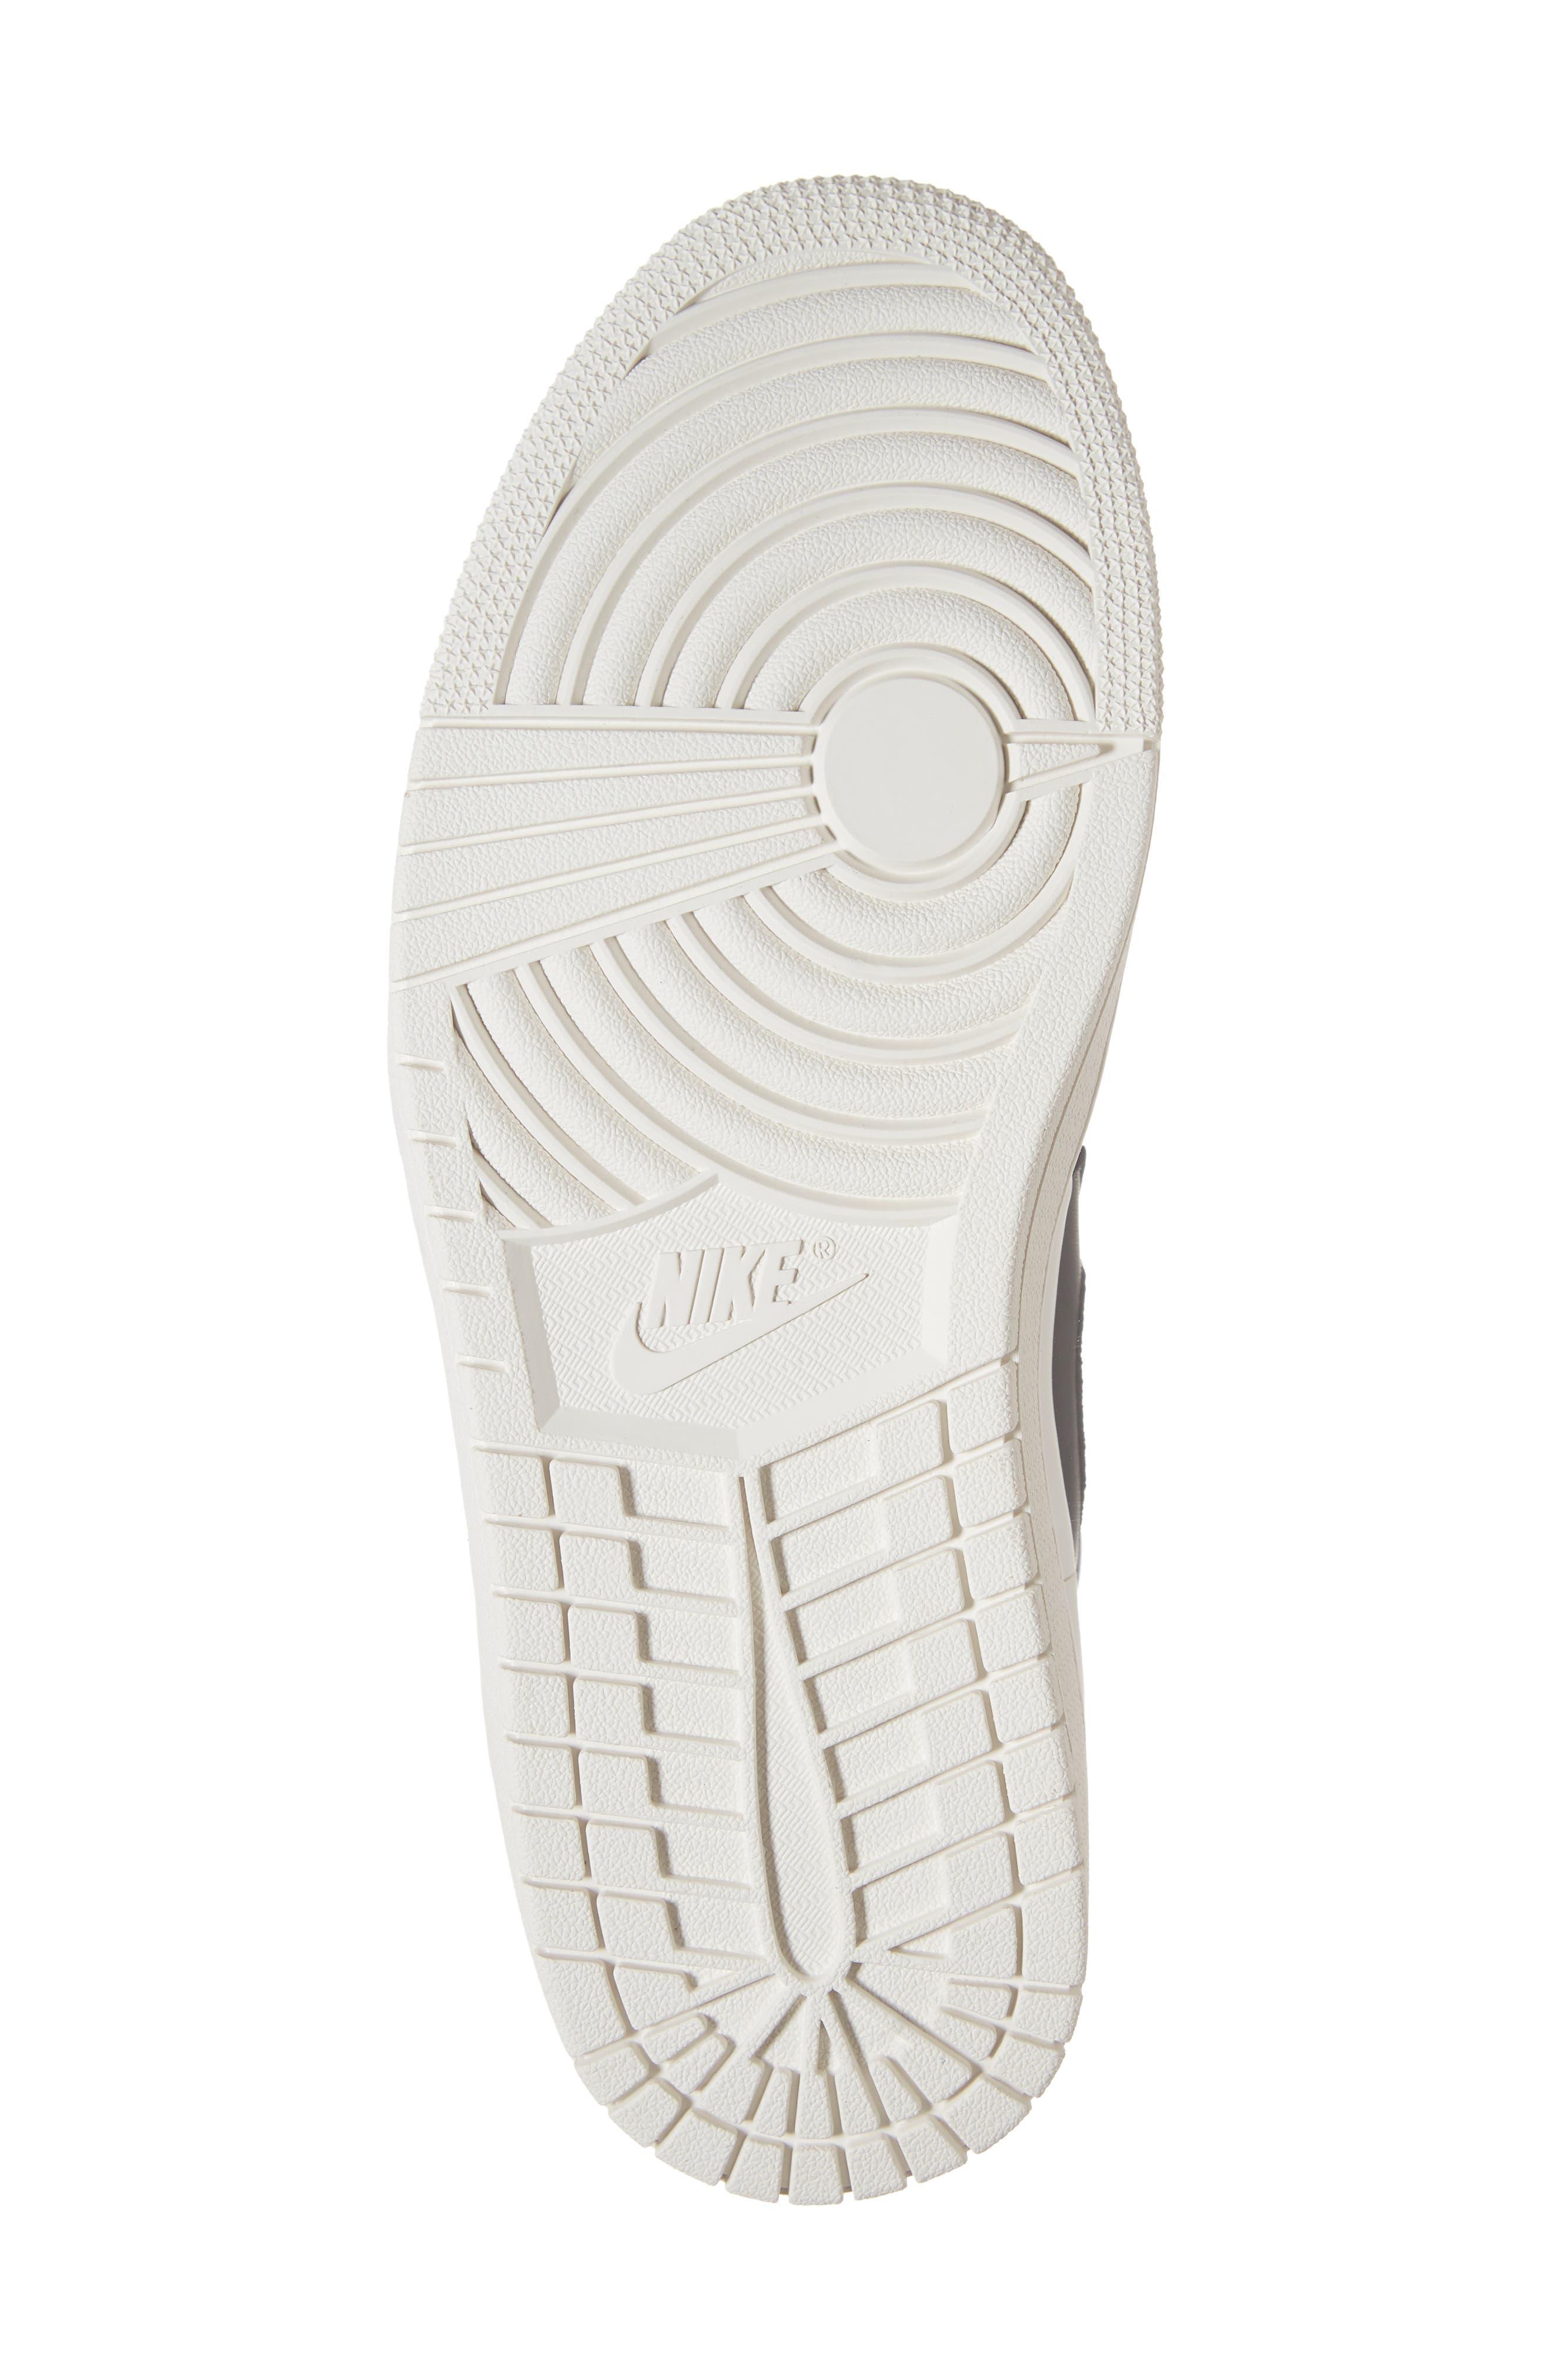 Air Jordan 1 Retro High Double Strap Sneaker,                             Alternate thumbnail 6, color,                             BLACK/ GYM RED